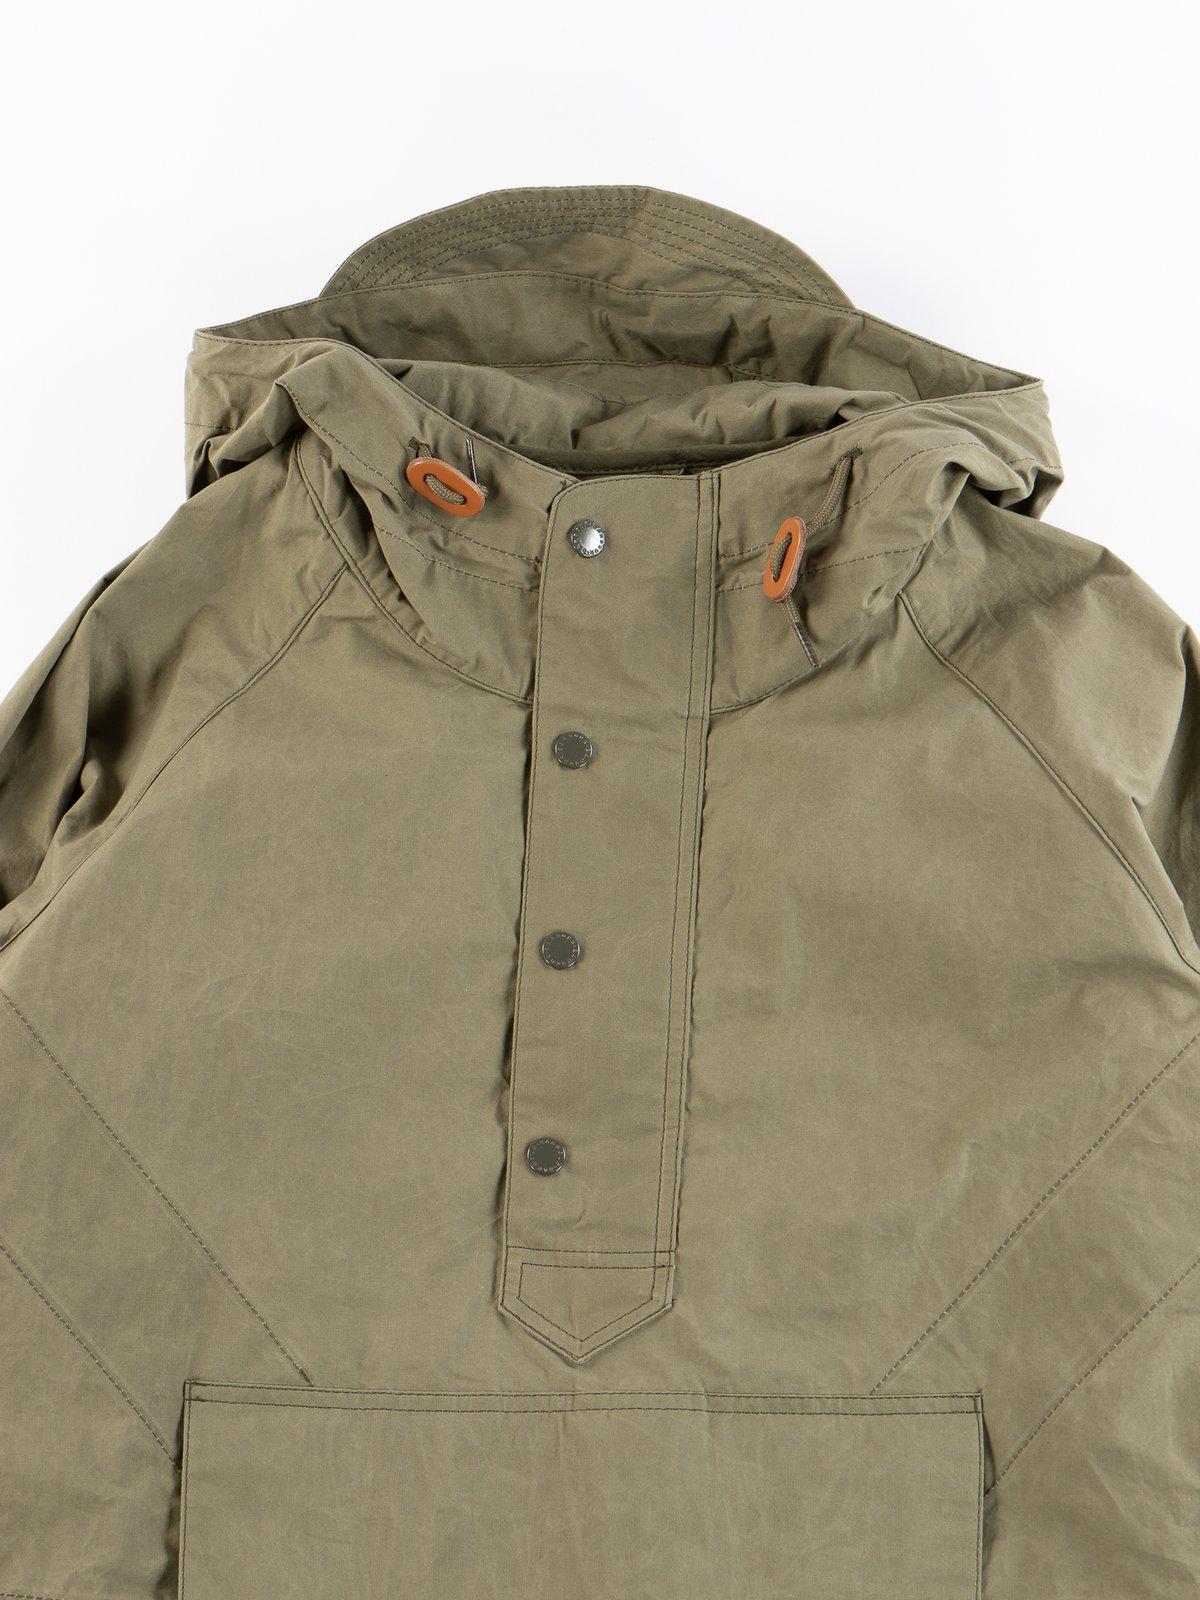 Olive Warby Jacket - Image 3